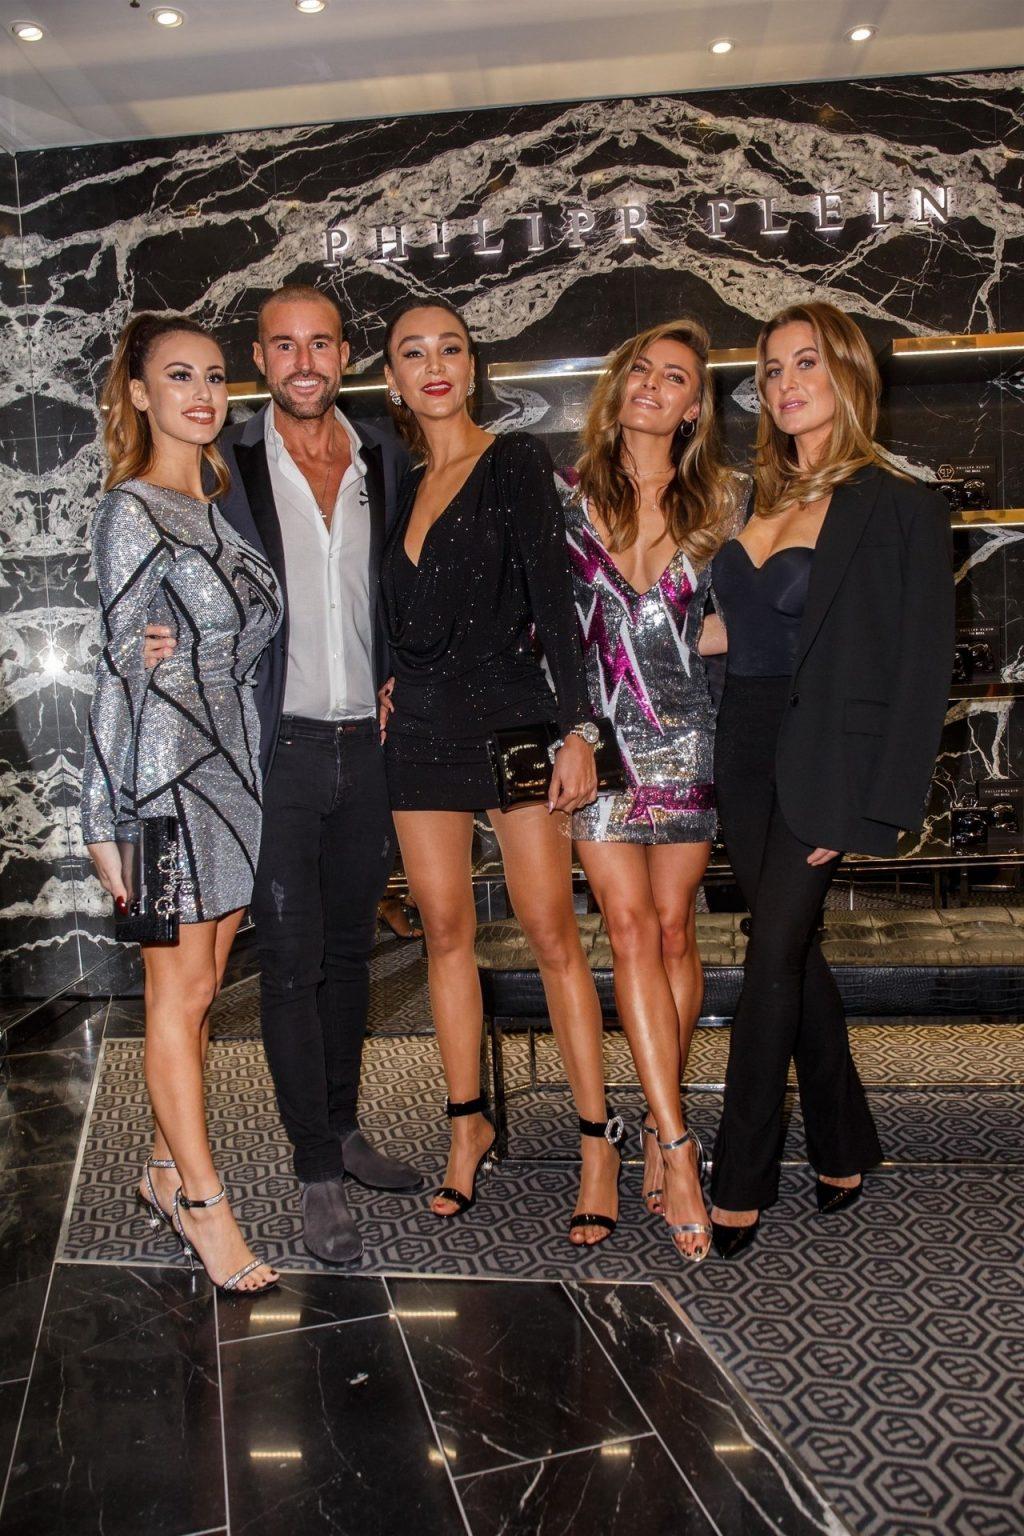 Sophia Thomalla, Verona Pooth, Charlotte Wurdig Sexy (27 Photos)